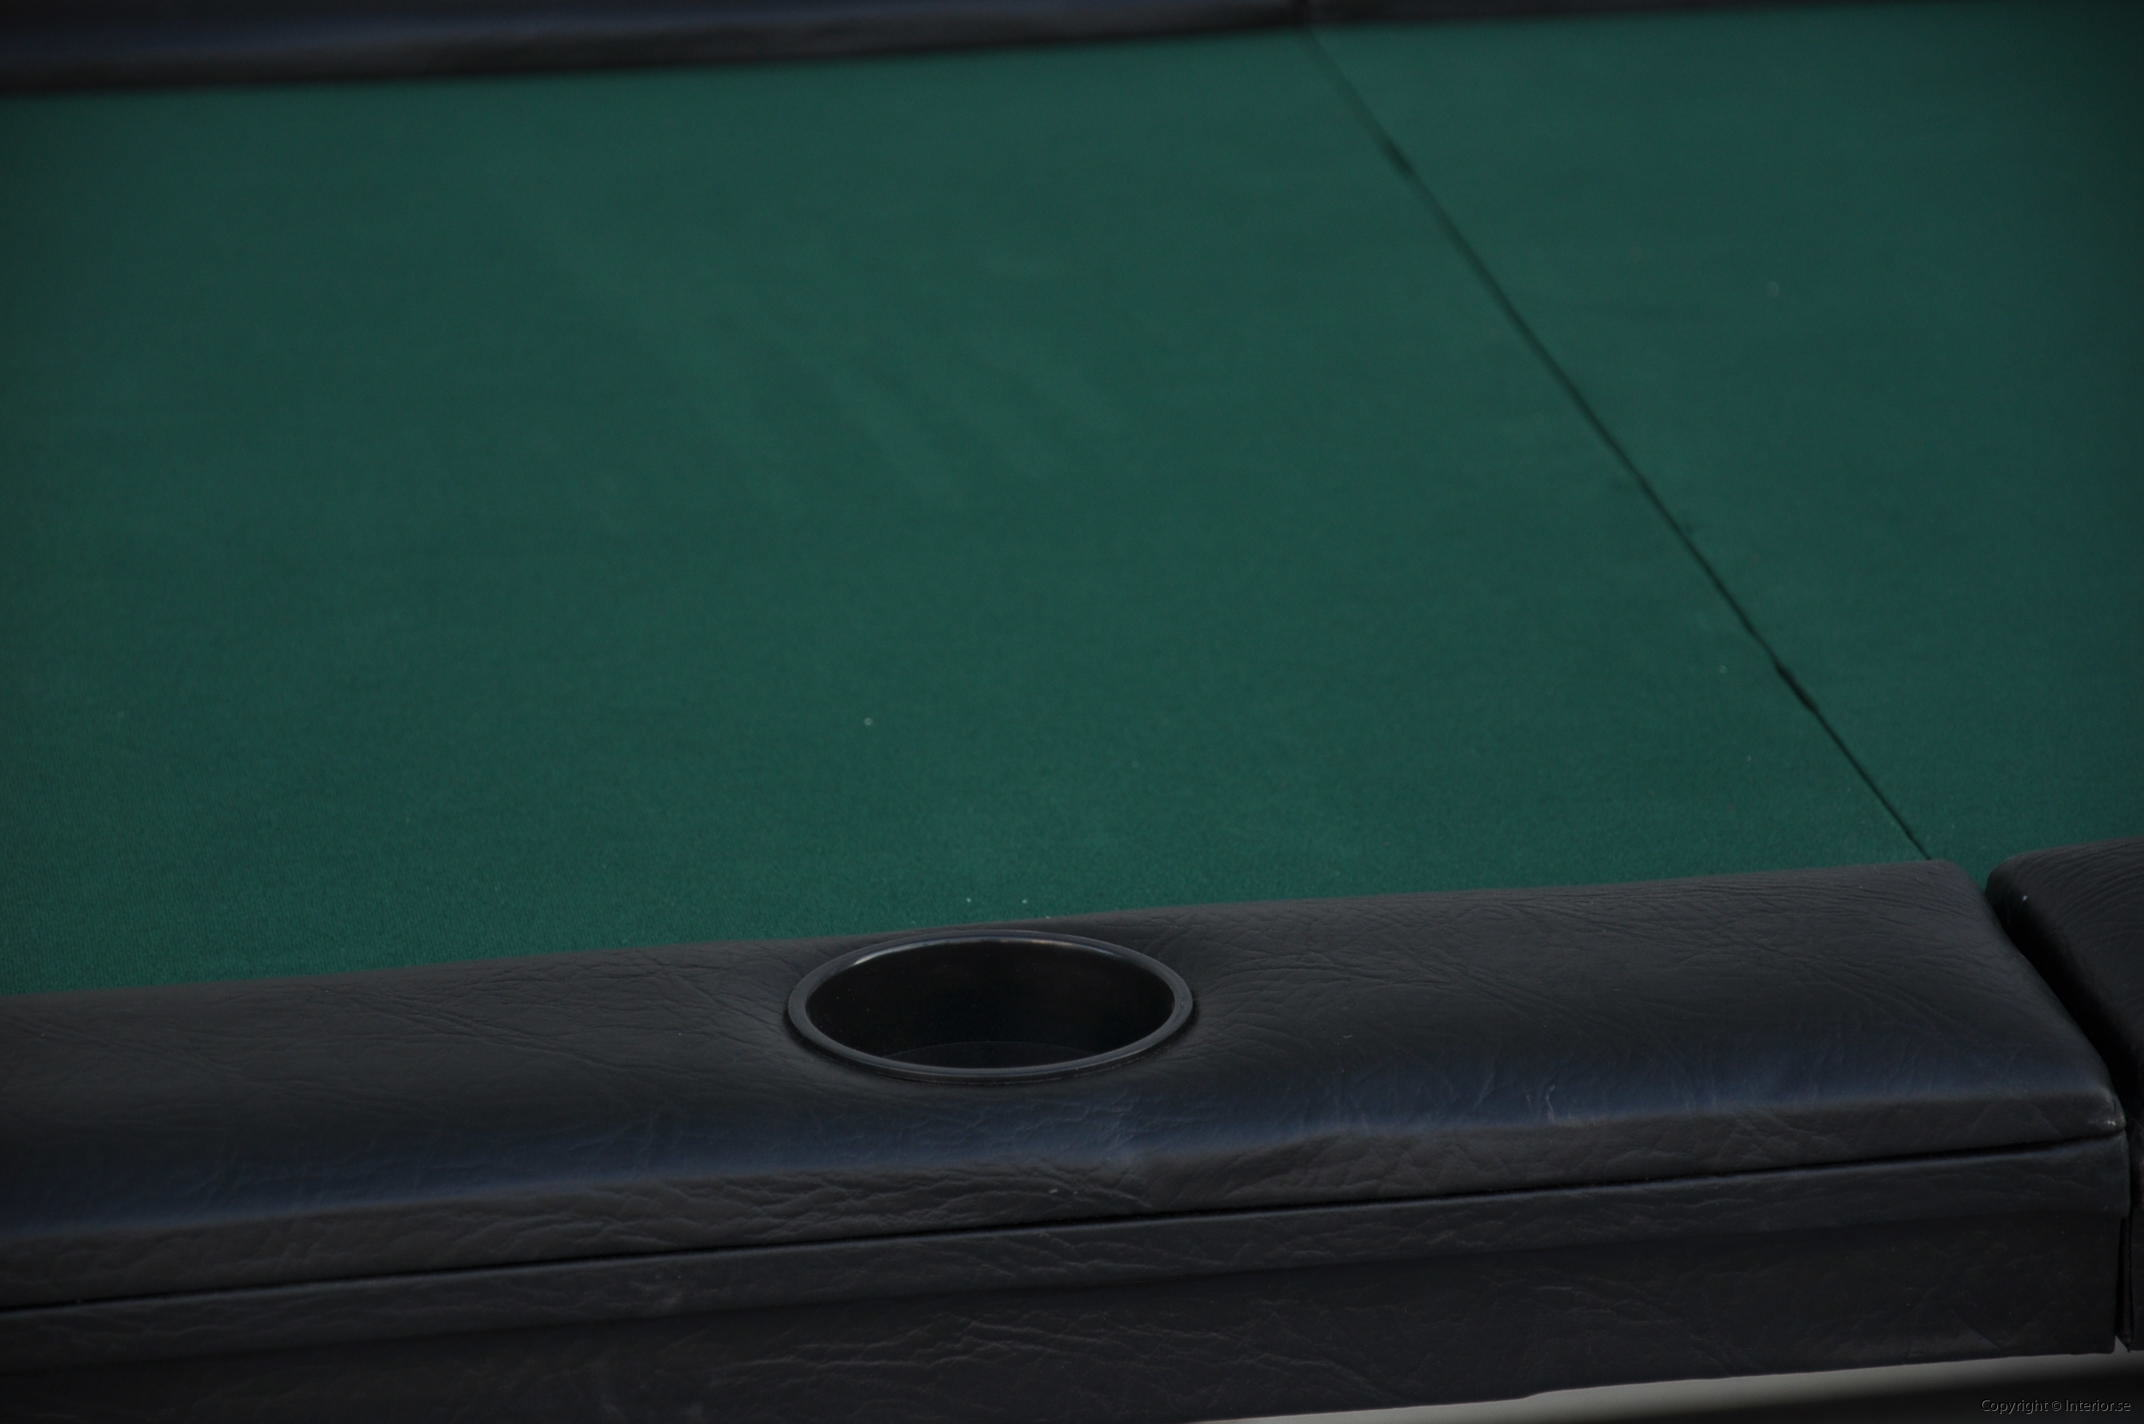 Hyra spelbord hyr pokerbord texas hold em blackjack pokerbord stockholm hyra spel (6)